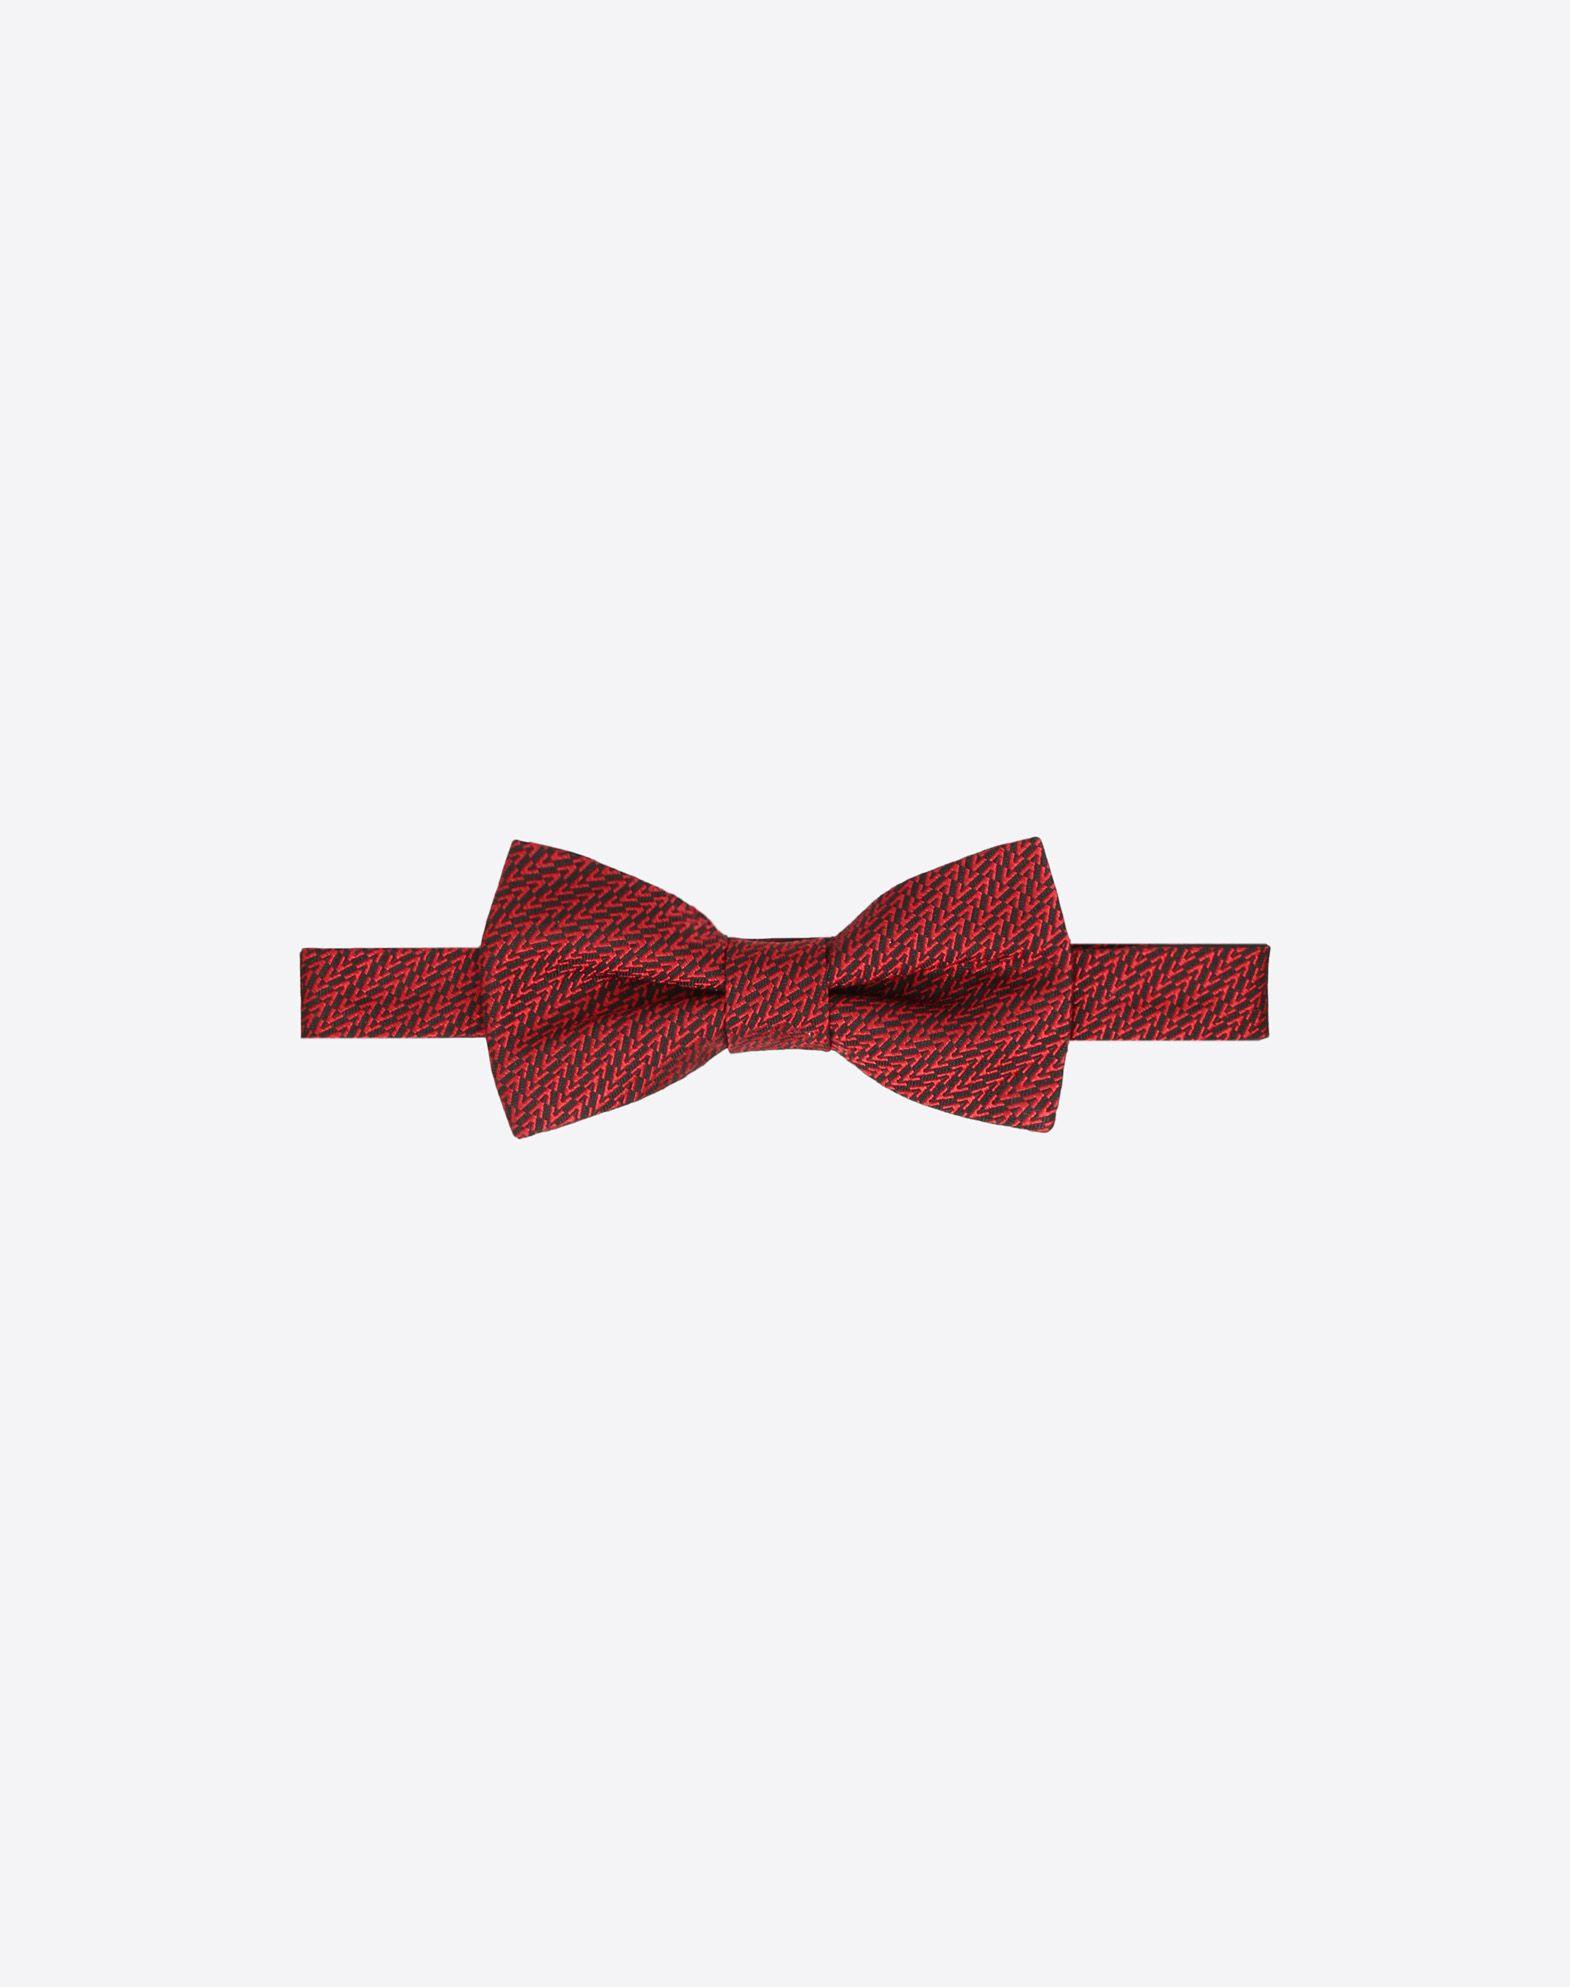 VALENTINO OPTICAL Bow Tie